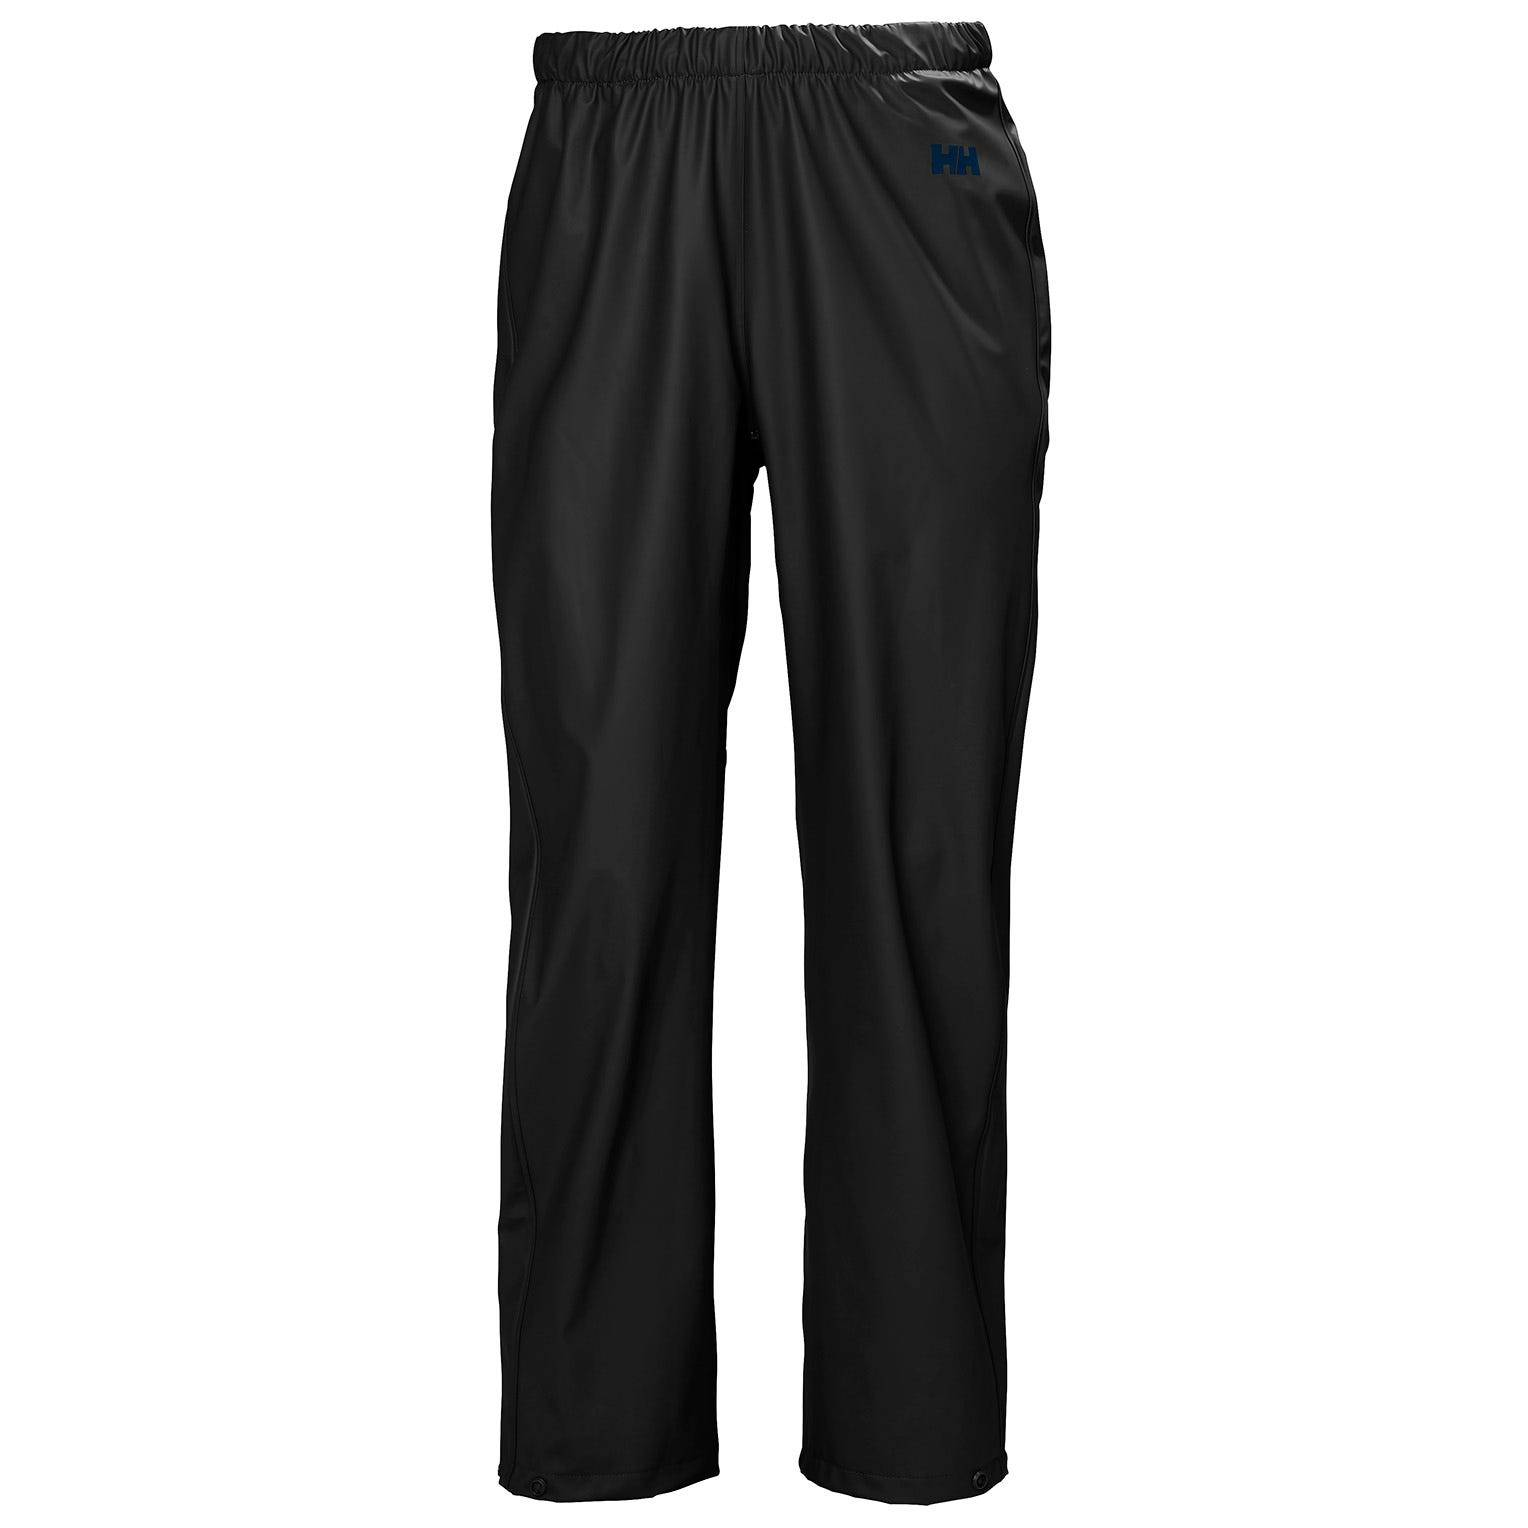 Helly Hansen W Loke Pants Womens Hiking Pant Black XS